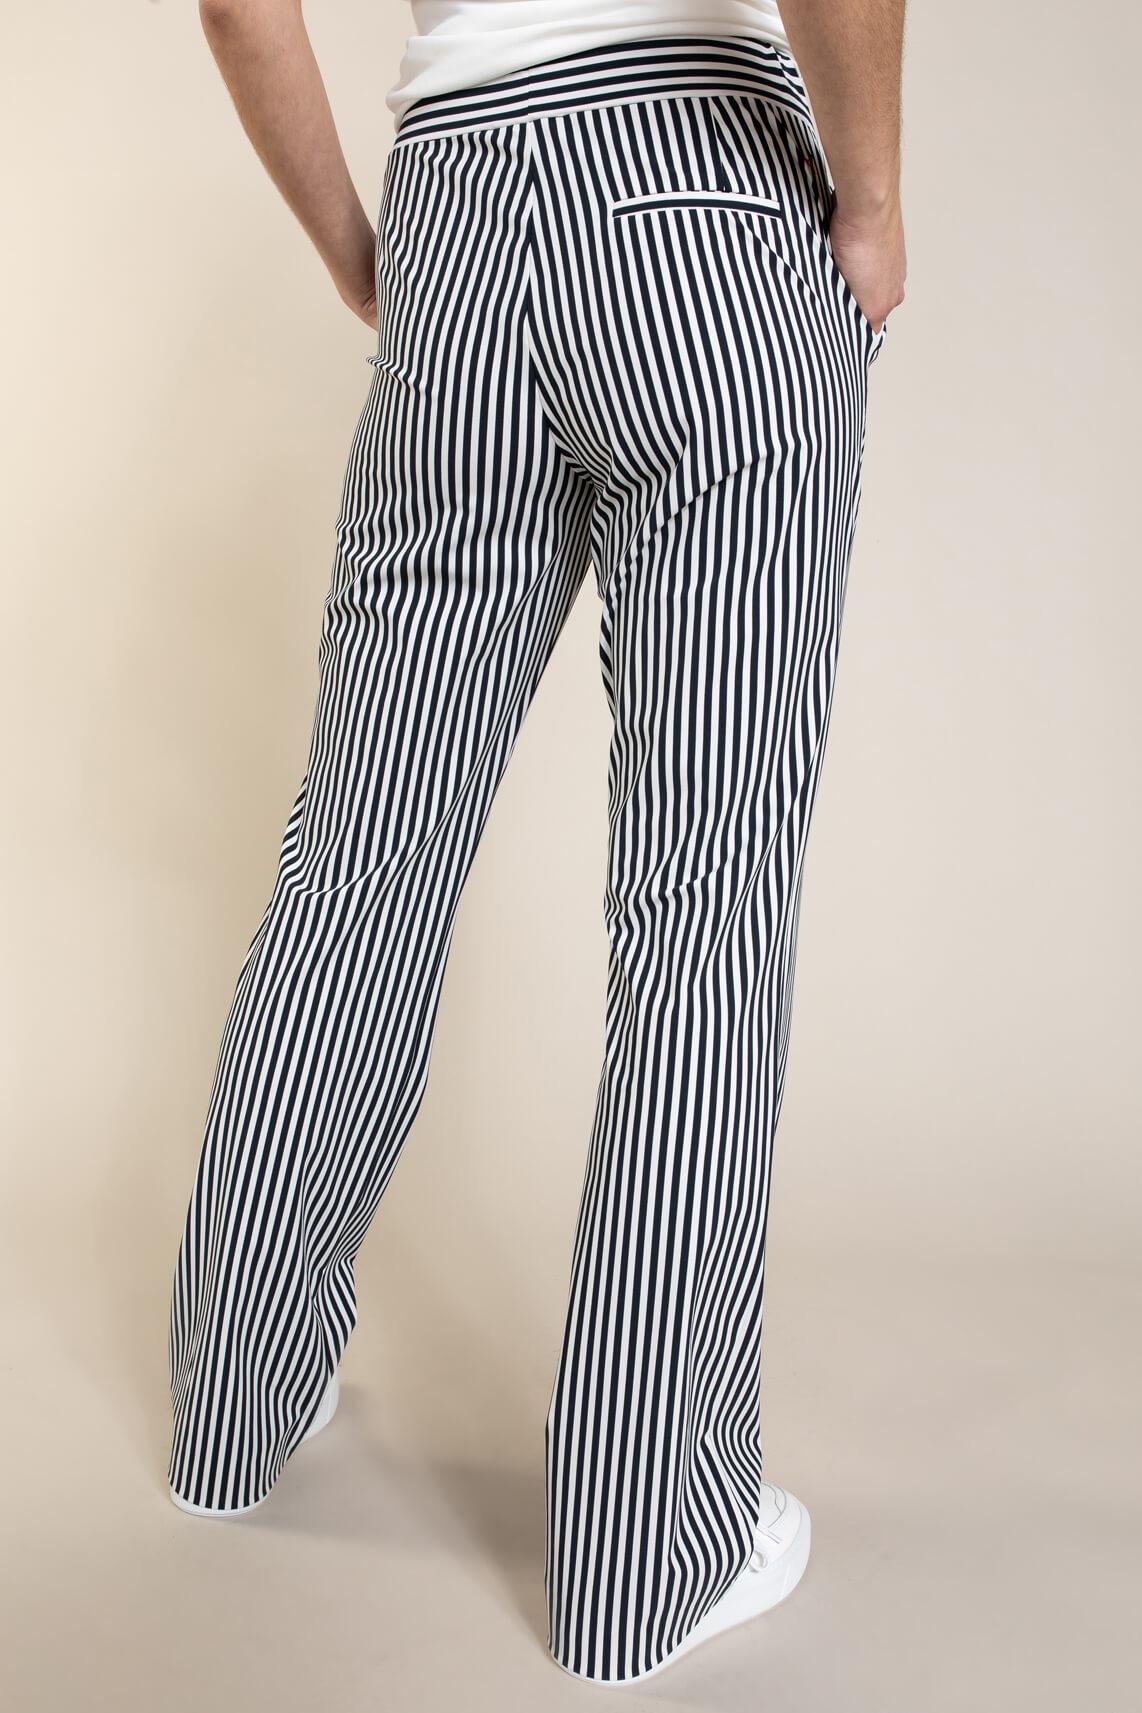 Anna Blue Dames Pantalon van travel kwaliteit Blauw